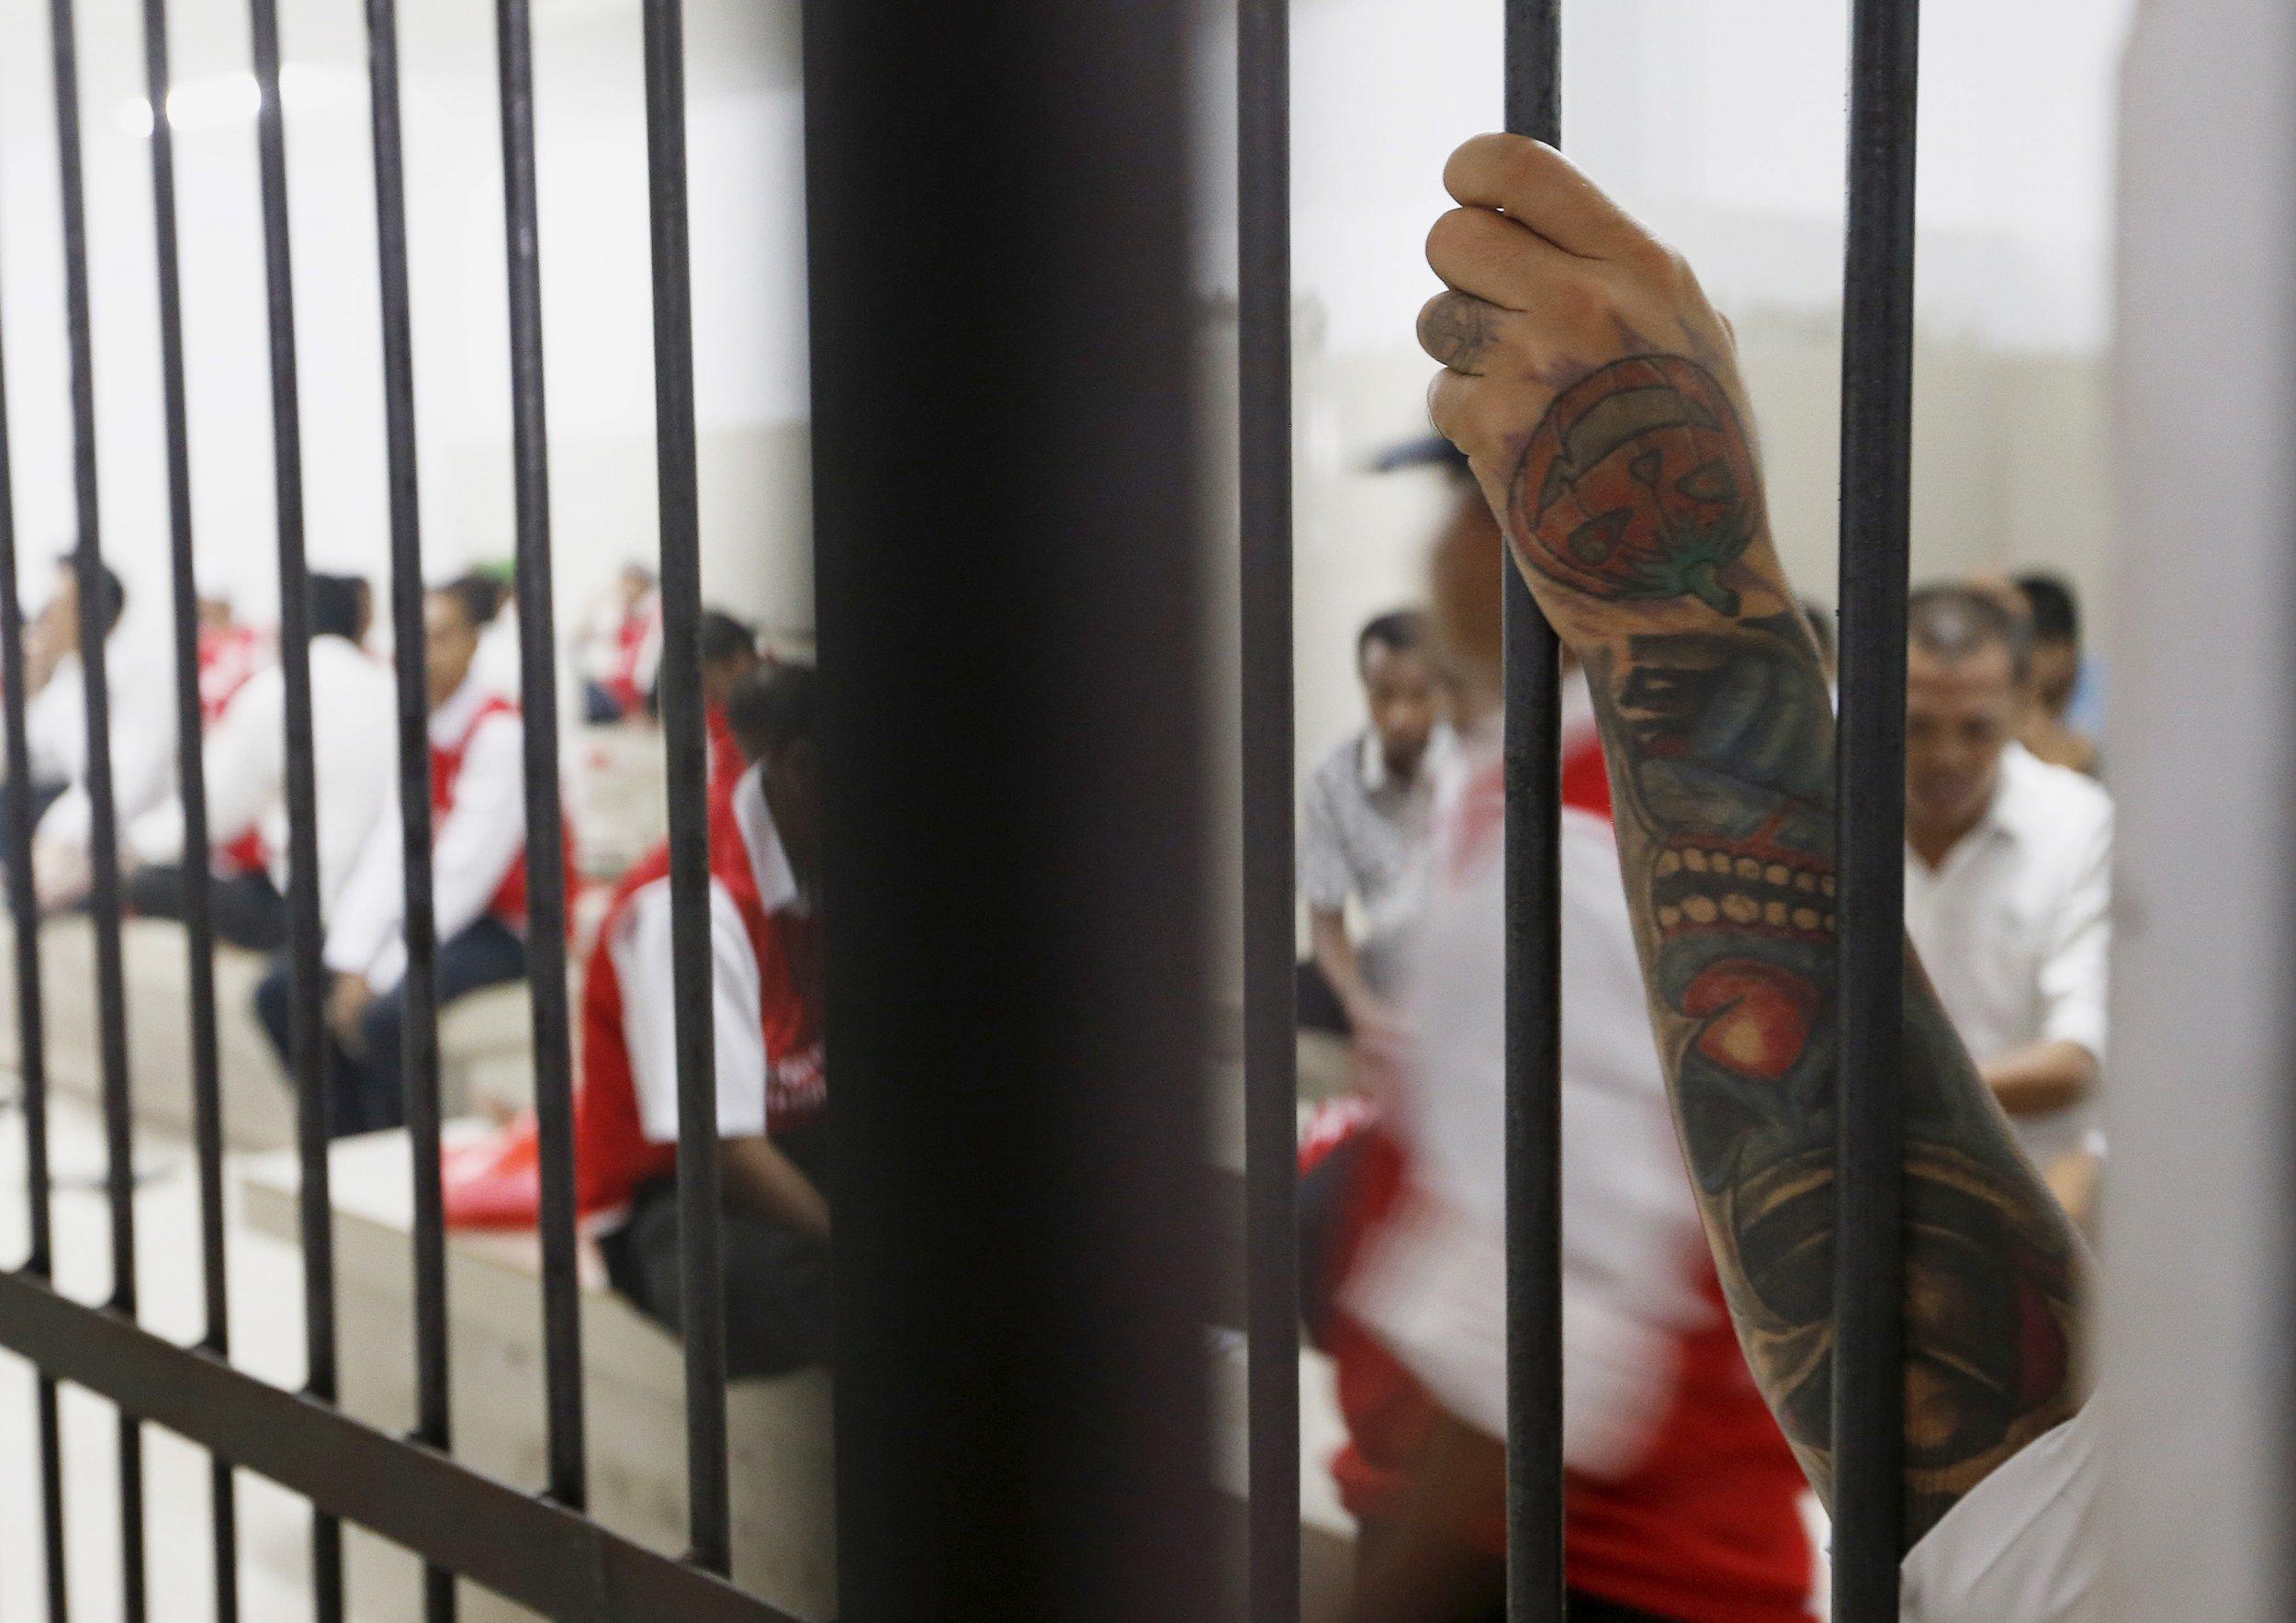 11_10_Drug_Addicts_Prison_01